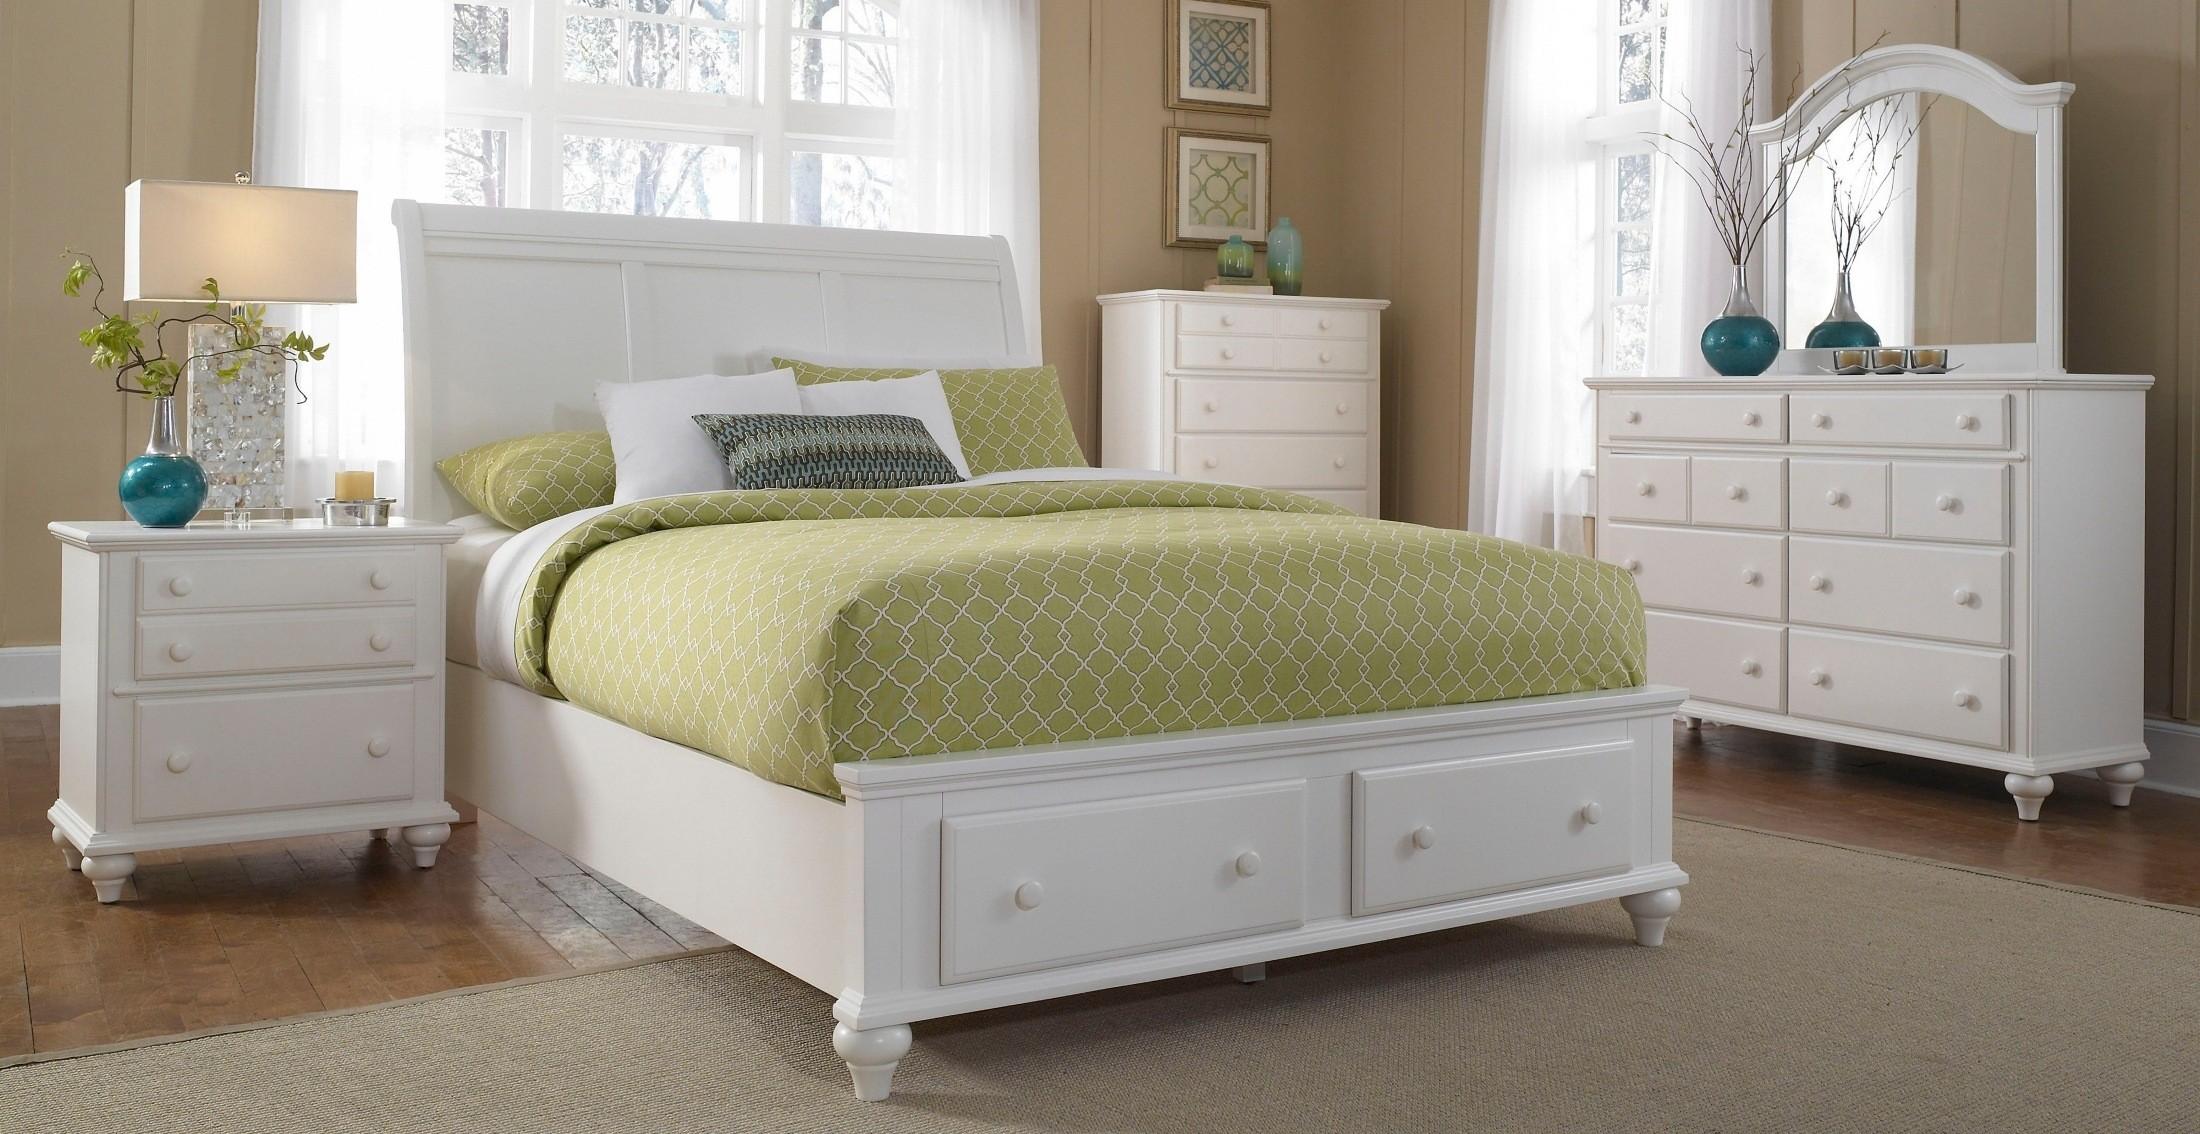 Hayden Place White Storage Sleigh Bedroom Set From Broyhill 4649 270 273 470 Coleman Furniture